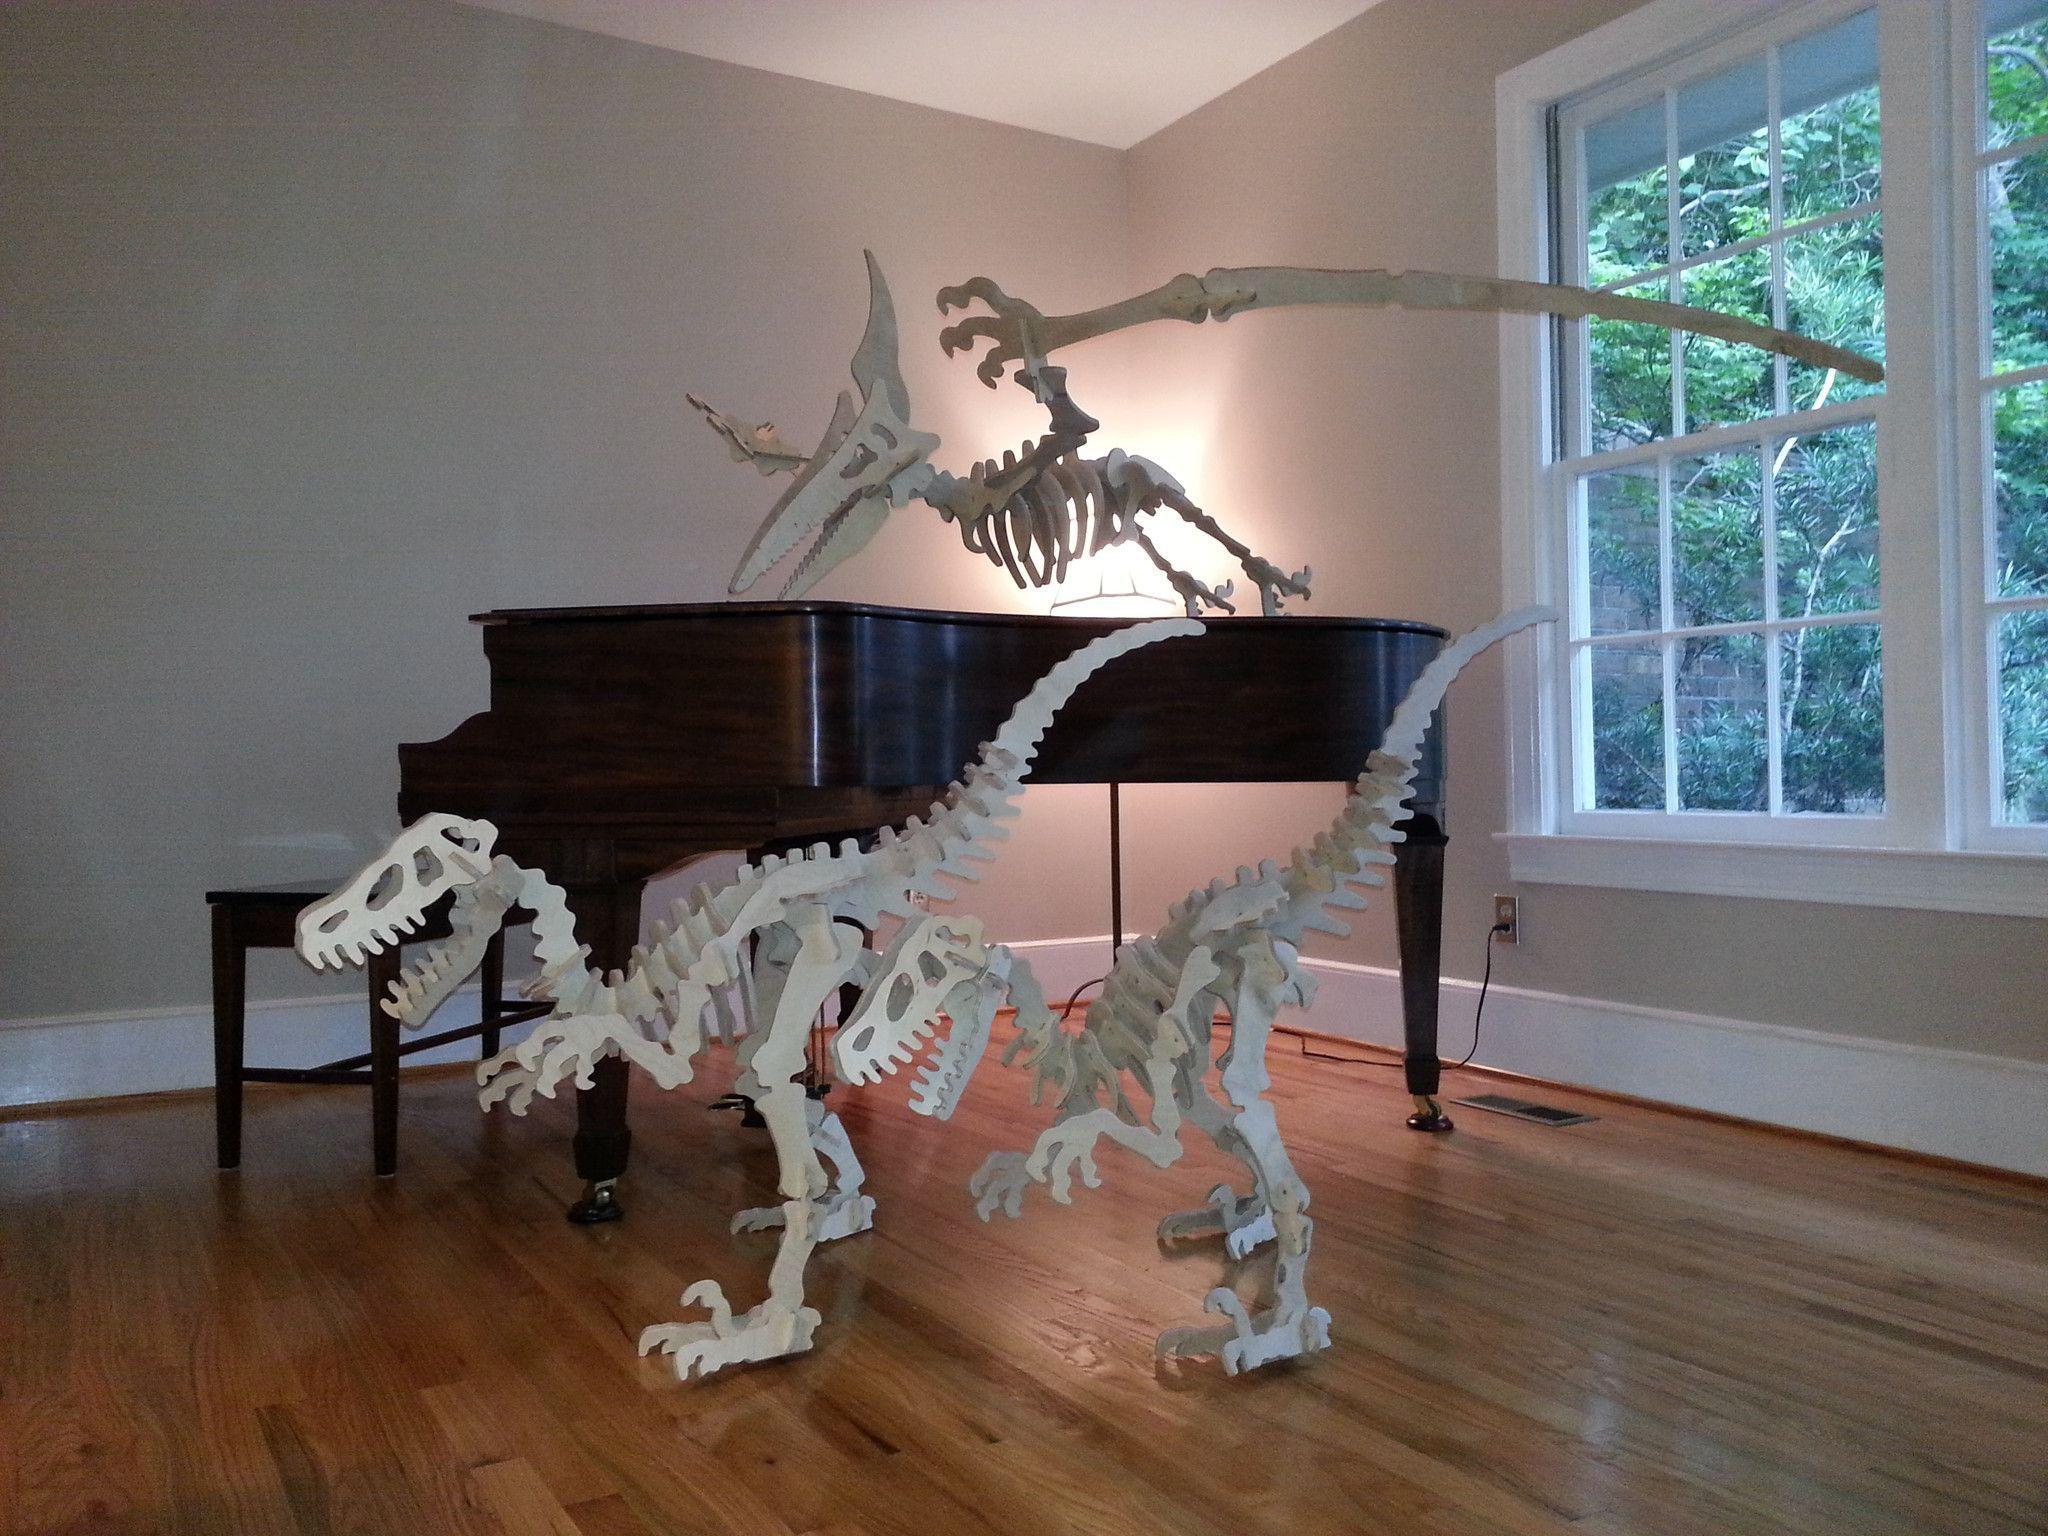 Pterodactyl 3d Dinosaur Puzzle